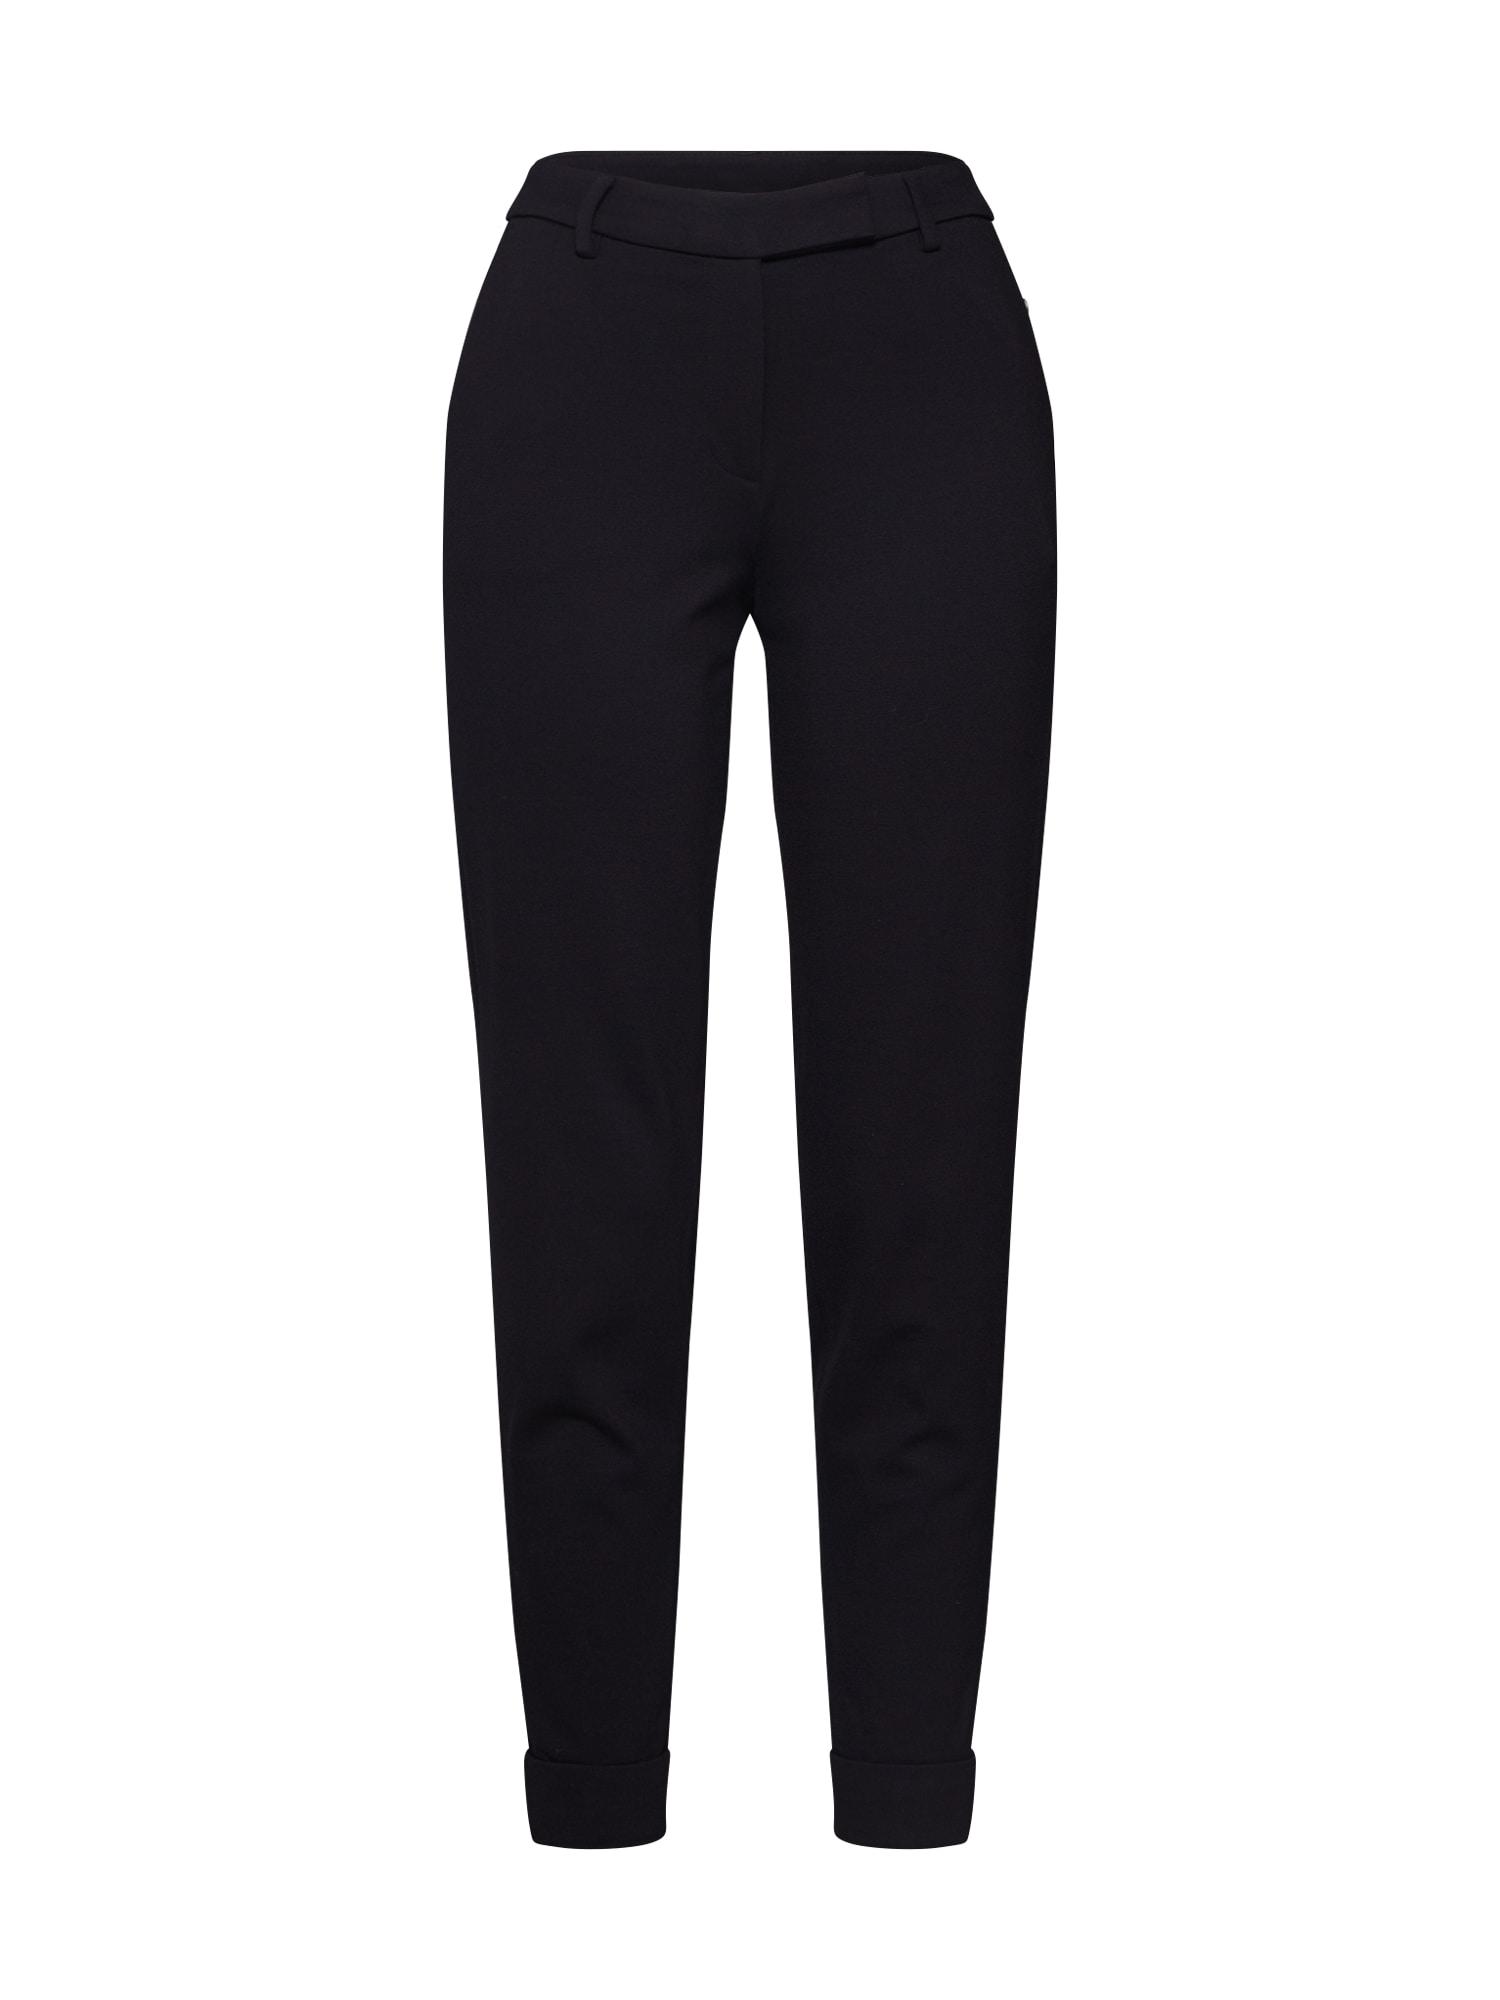 ESPRIT Chino stiliaus kelnės 'Smart Chino' juoda